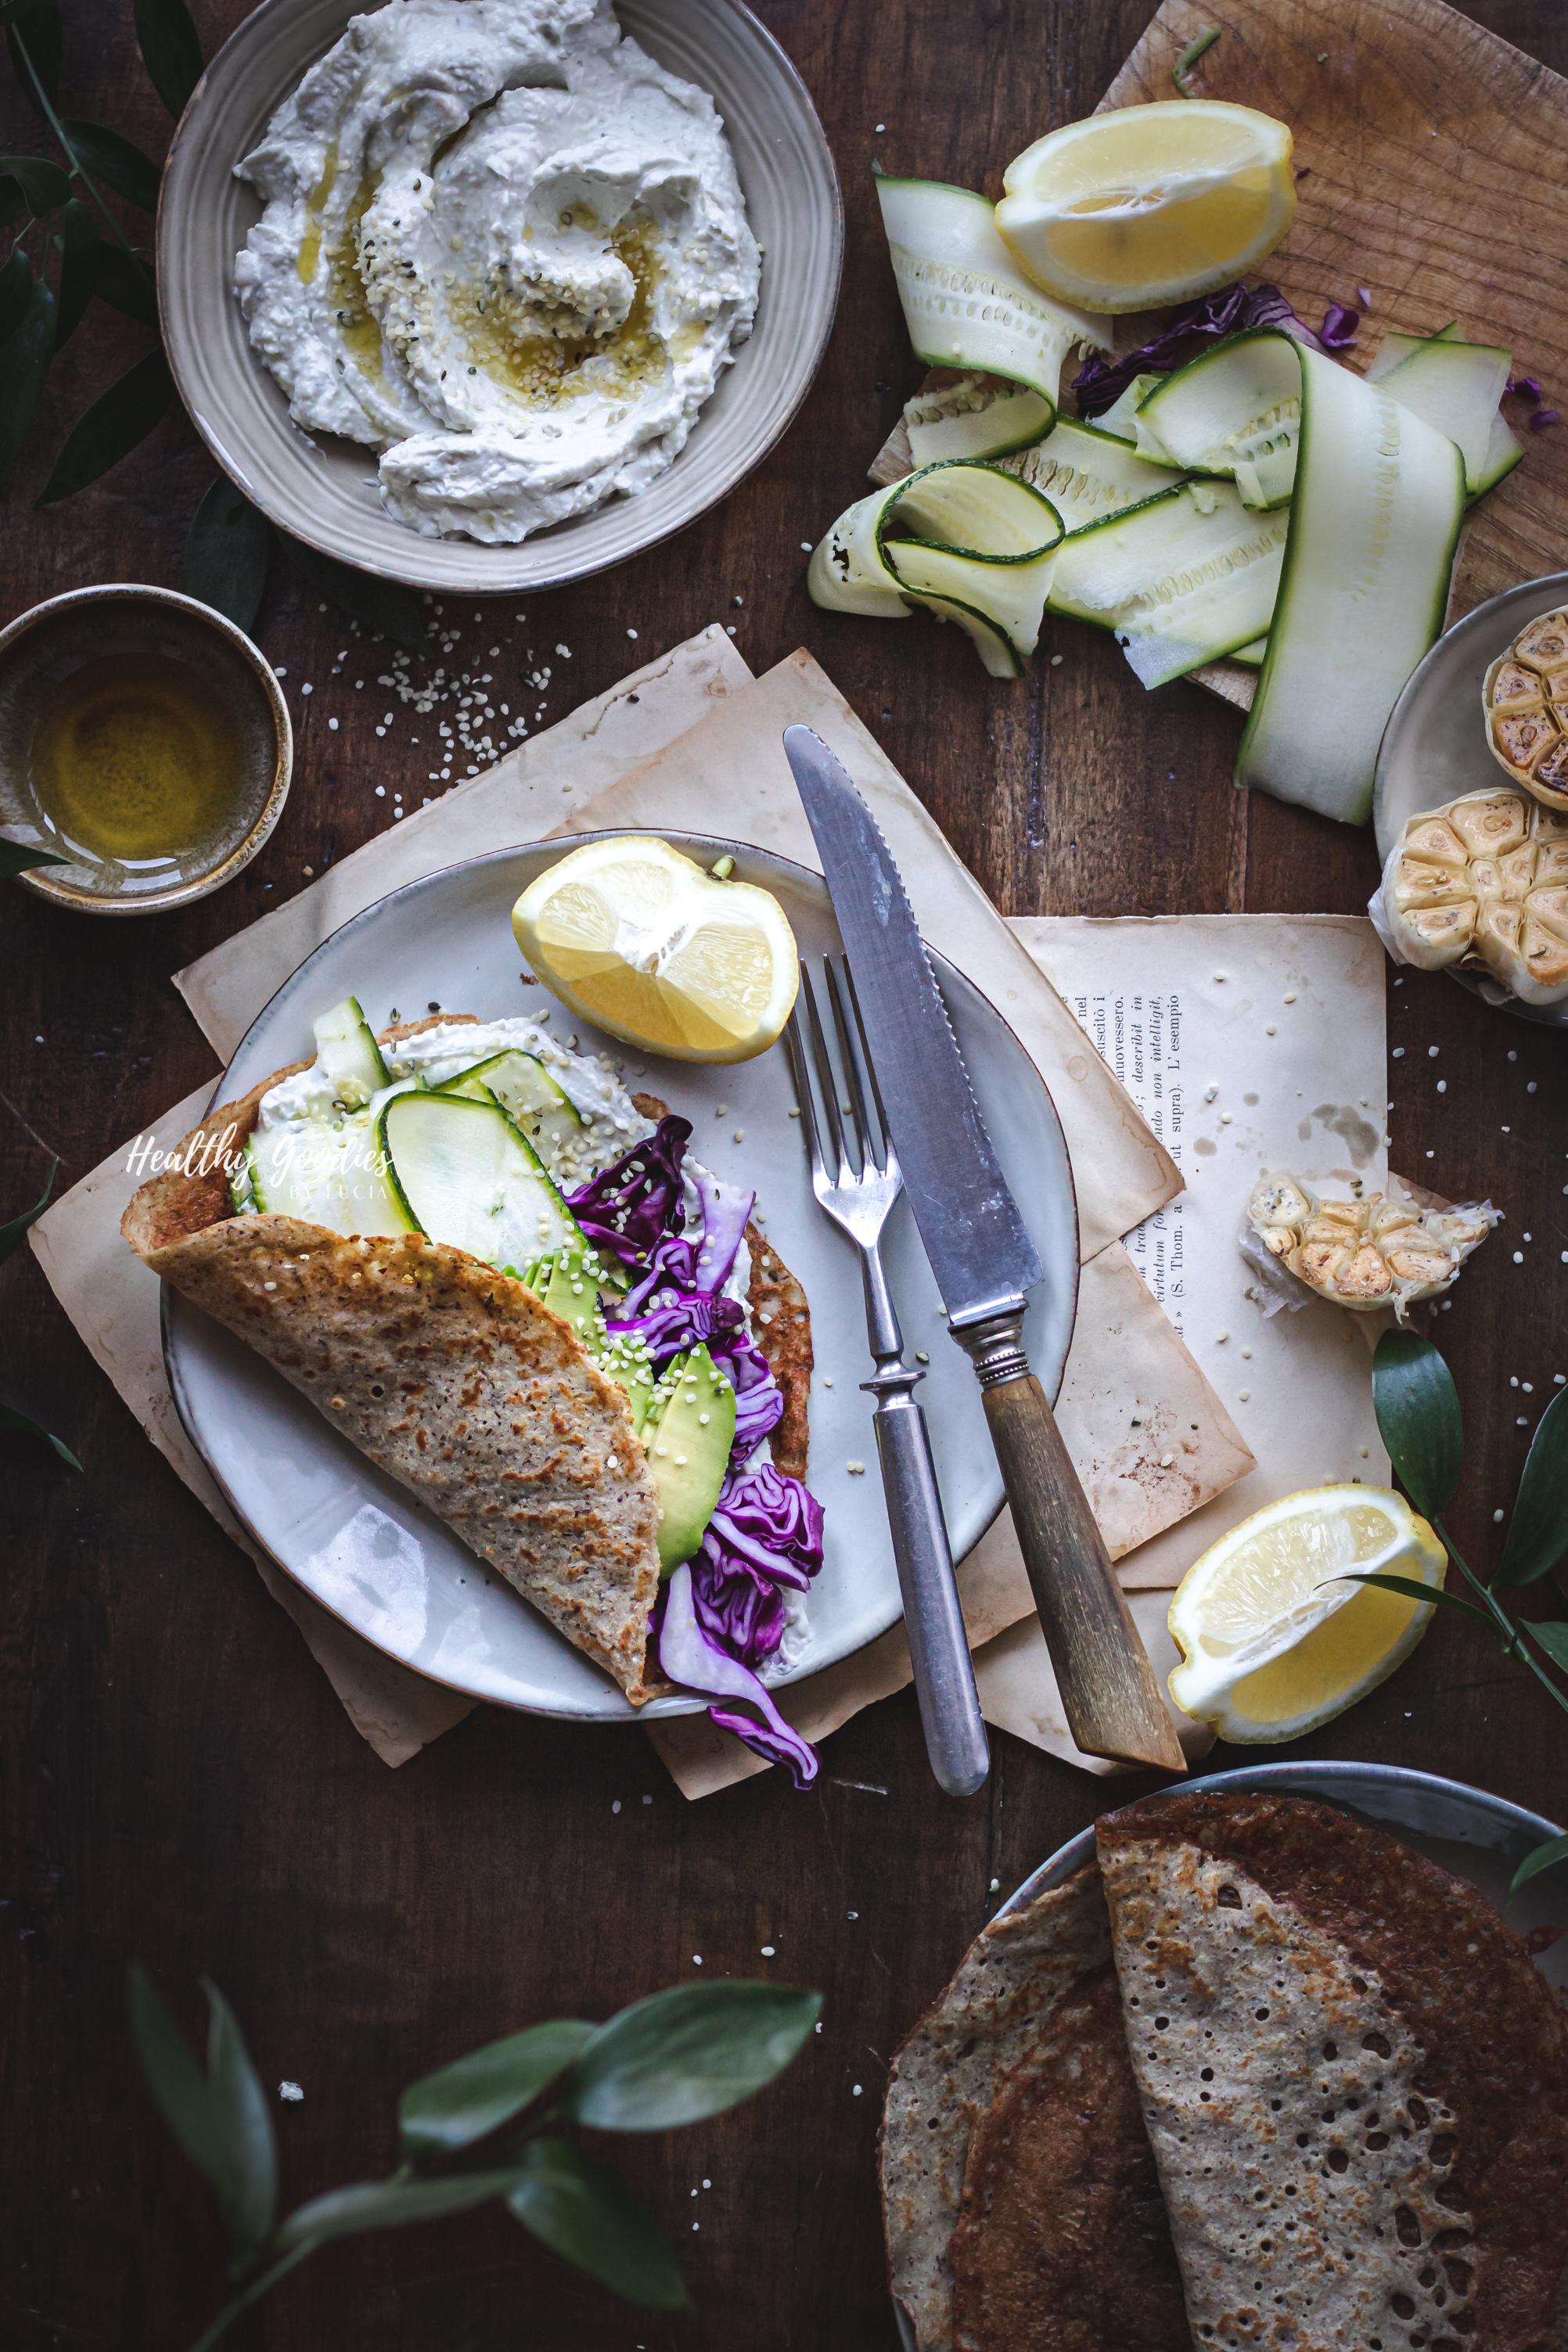 Veggie pancakes with garlic cream cheese | Healthy Goodies by Lucia Marecak